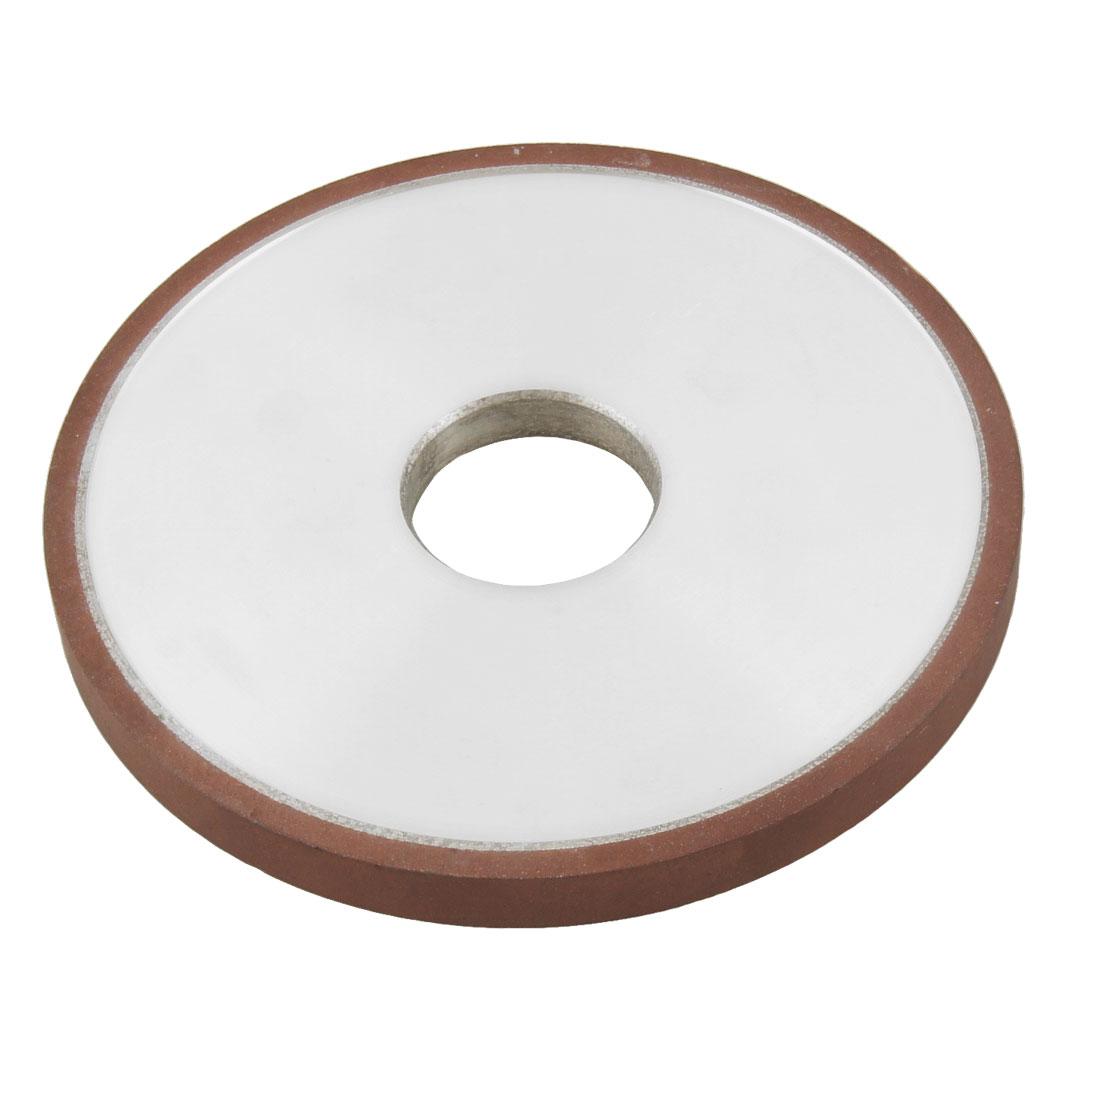 125mm x 32mm 240 Grit 75% Resin Bond Plain Type Diamond Grinding Wheel Grinder